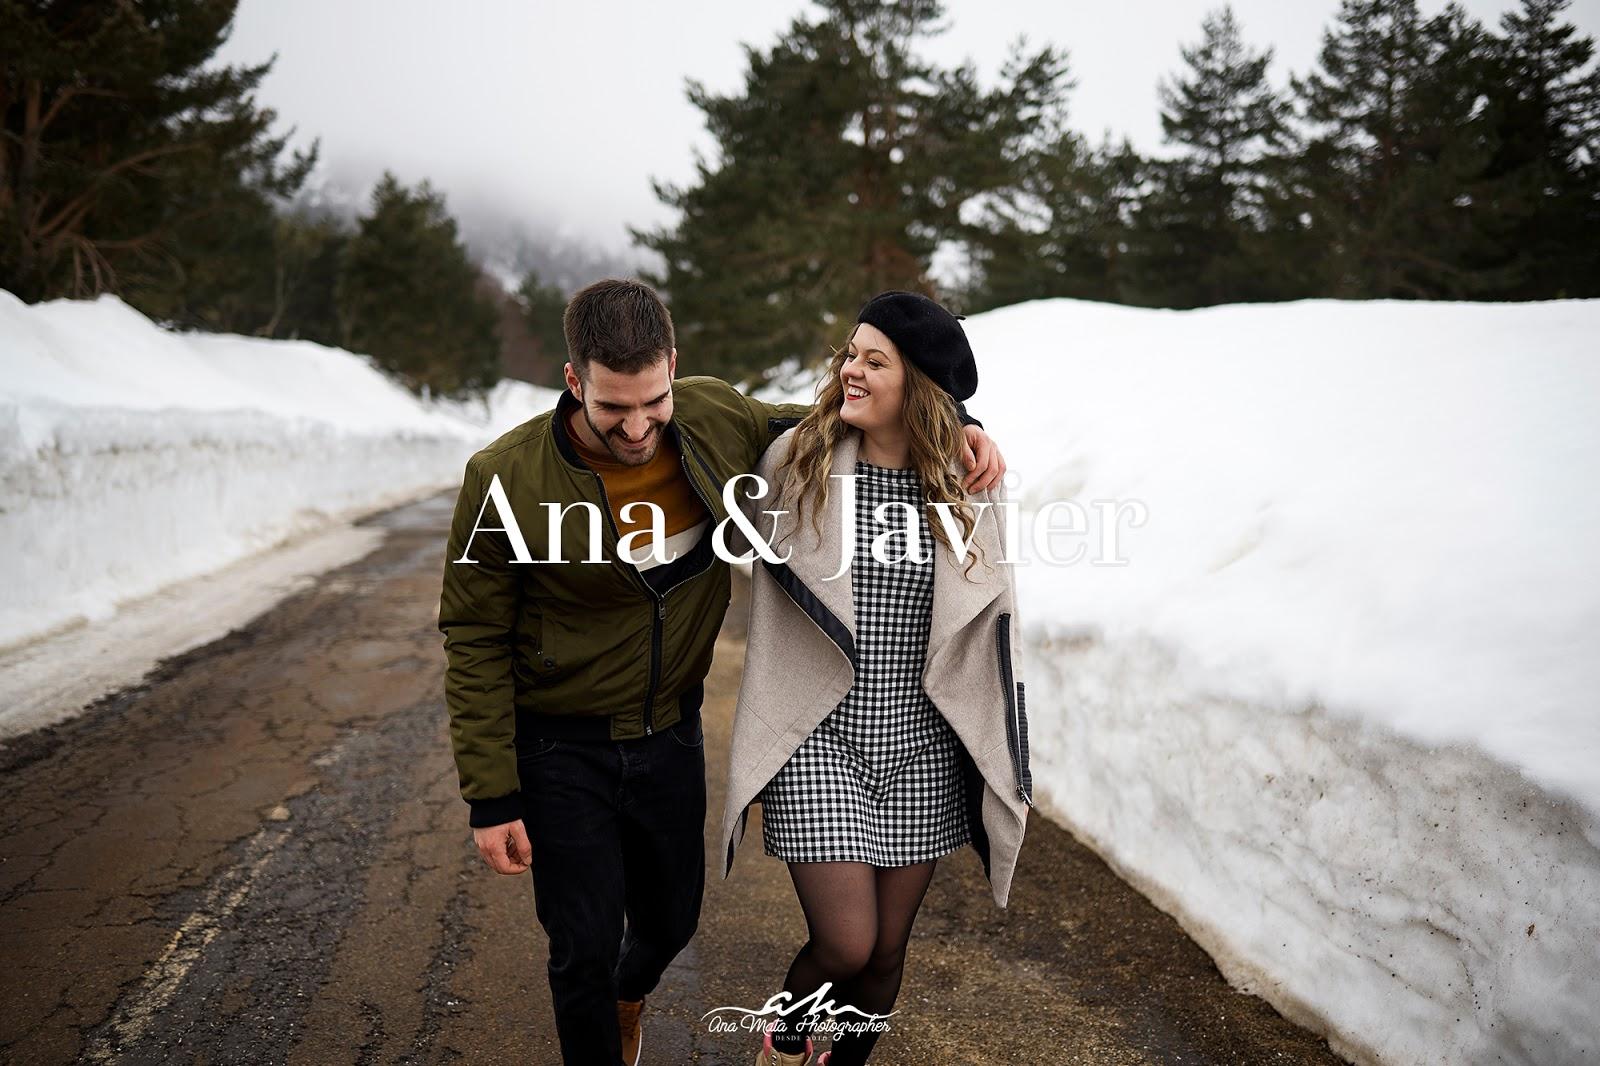 Preboda Ana & Javier. Febrero 2019